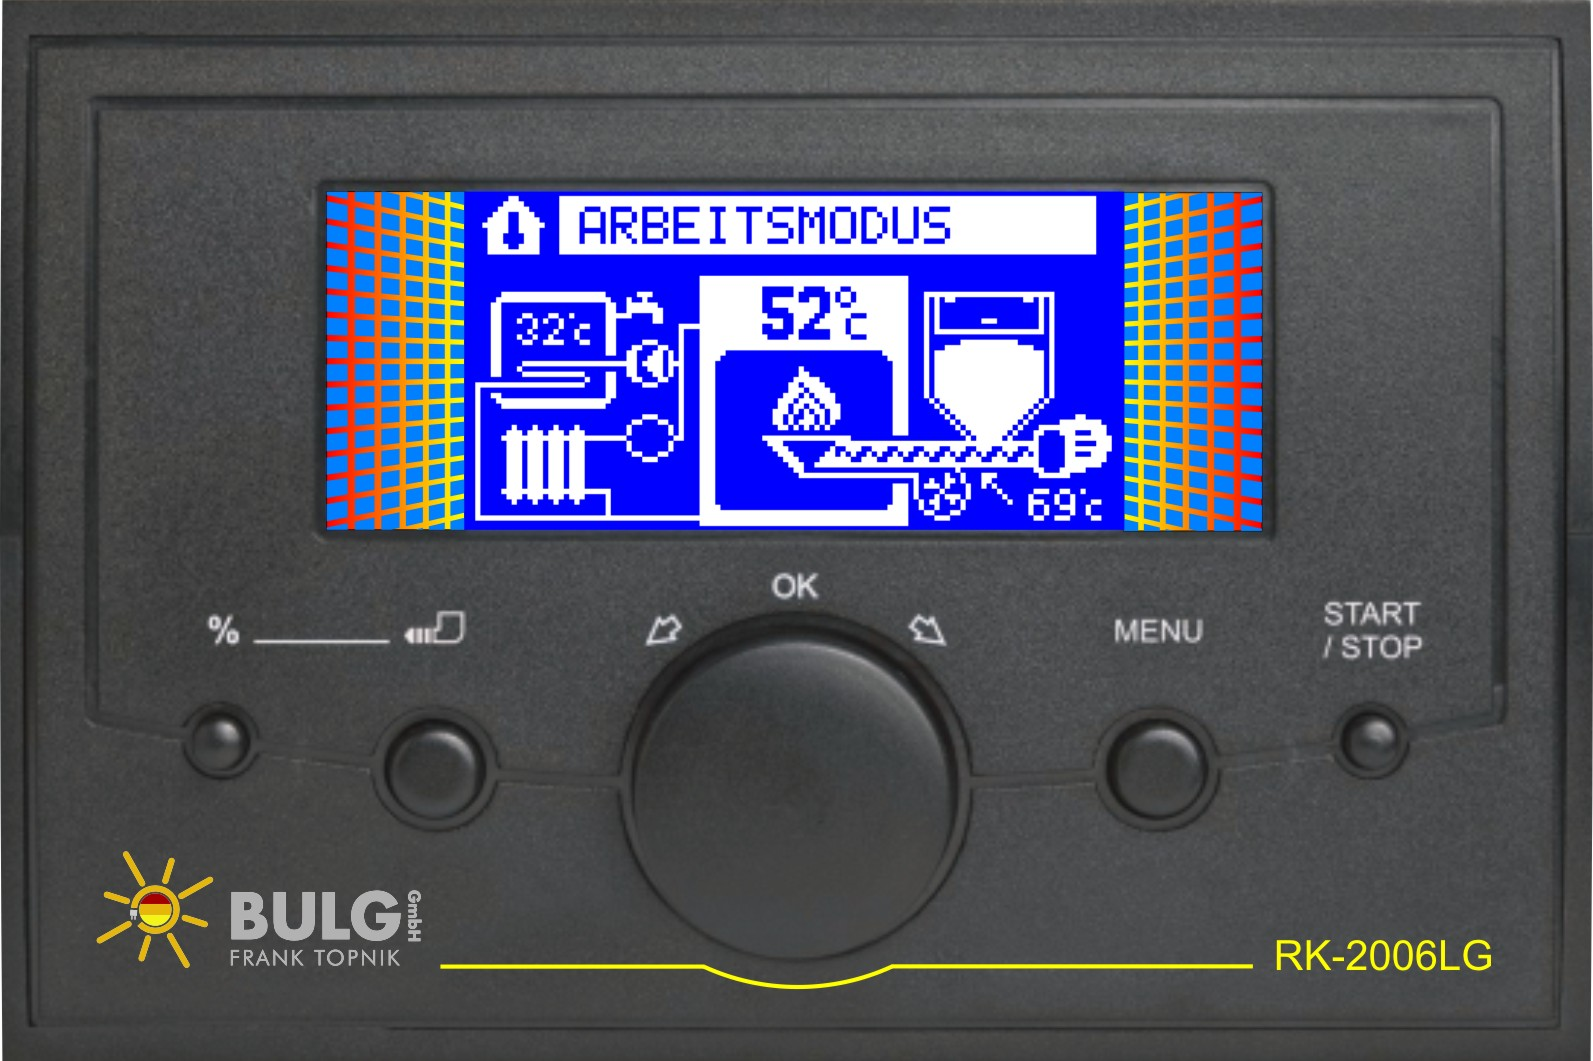 Bulg Kesselsteuerung RK-2006 LG